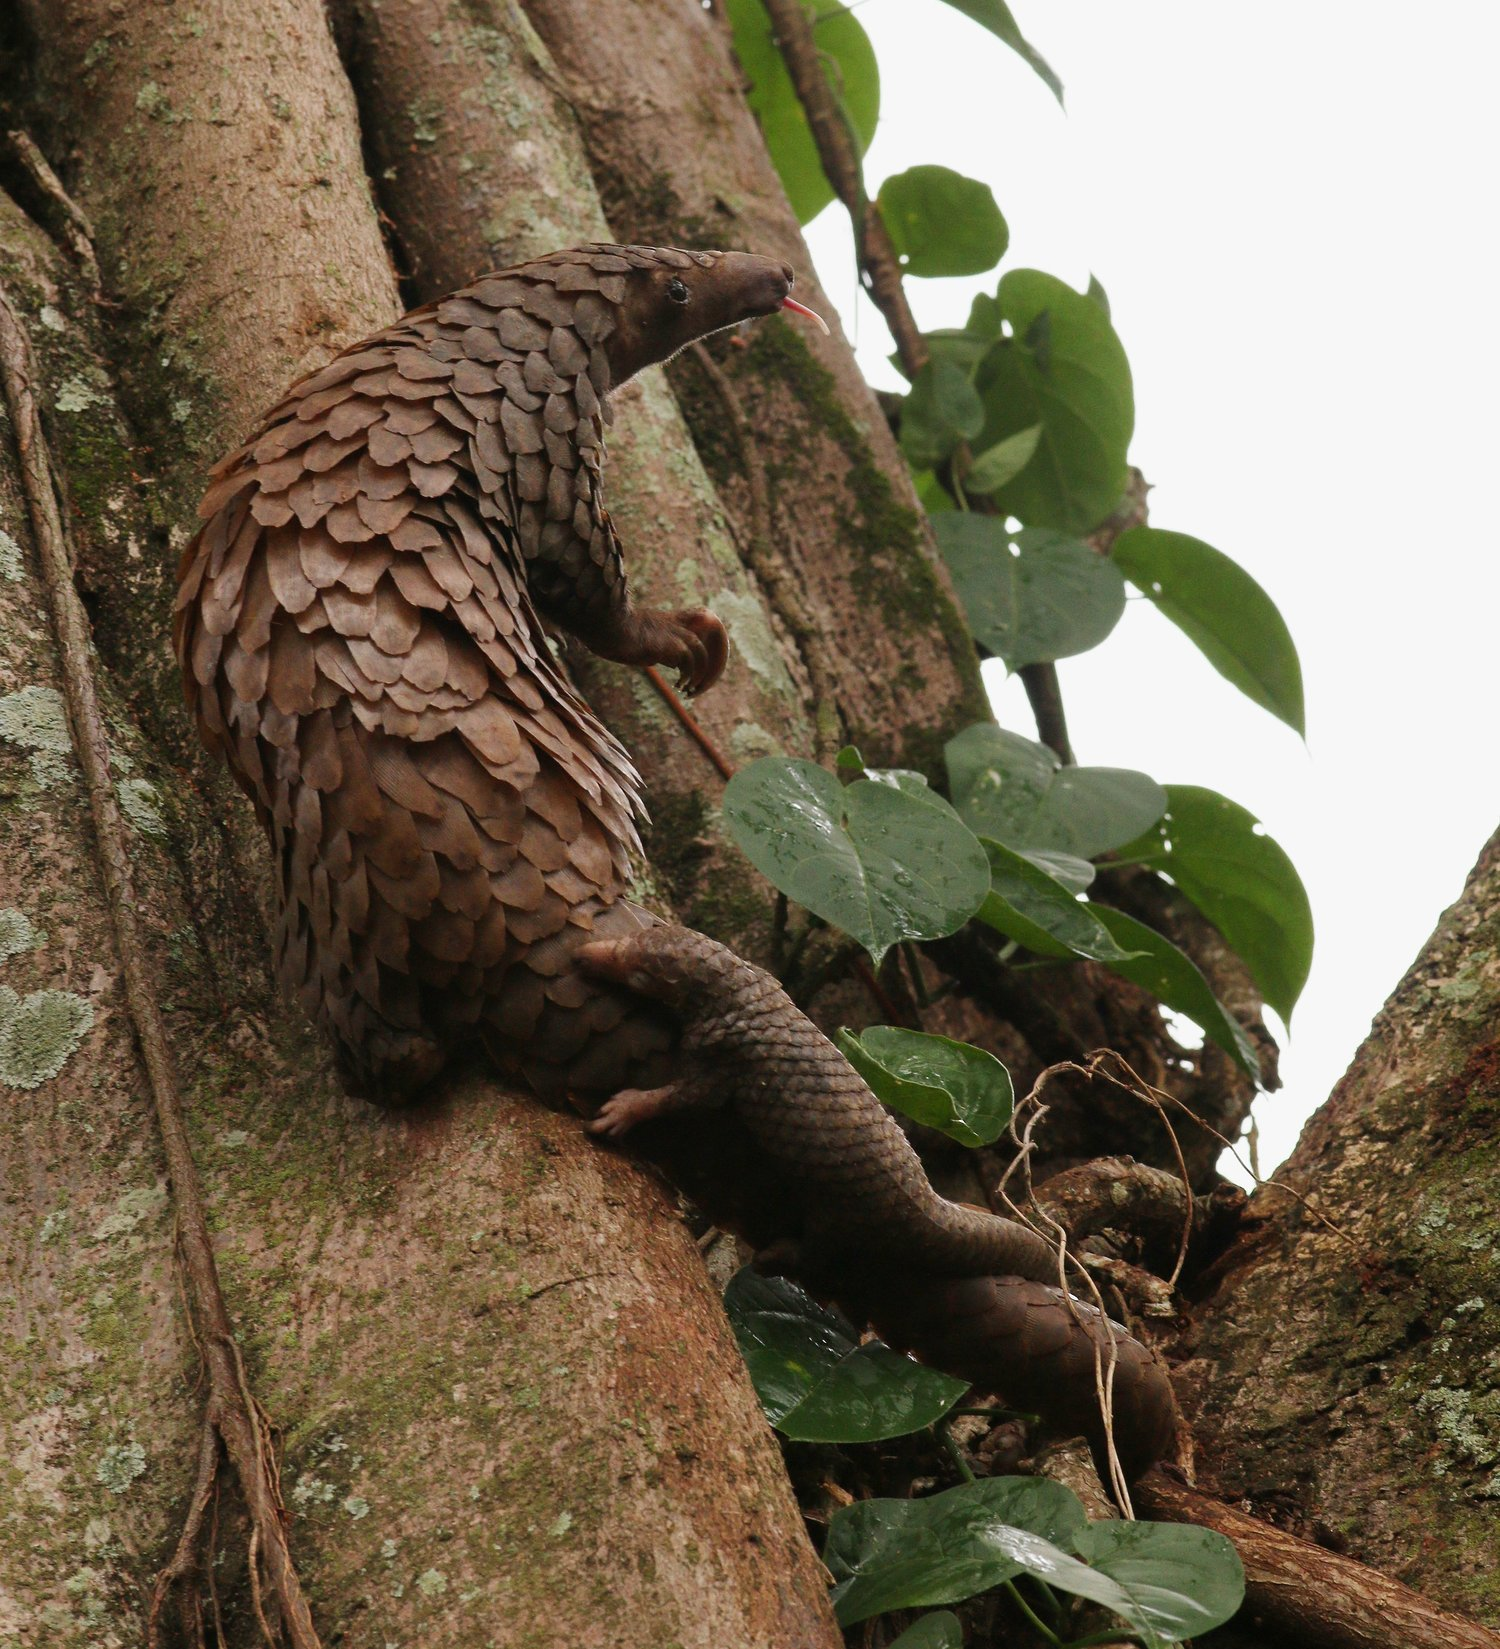 climbing pangolin patch